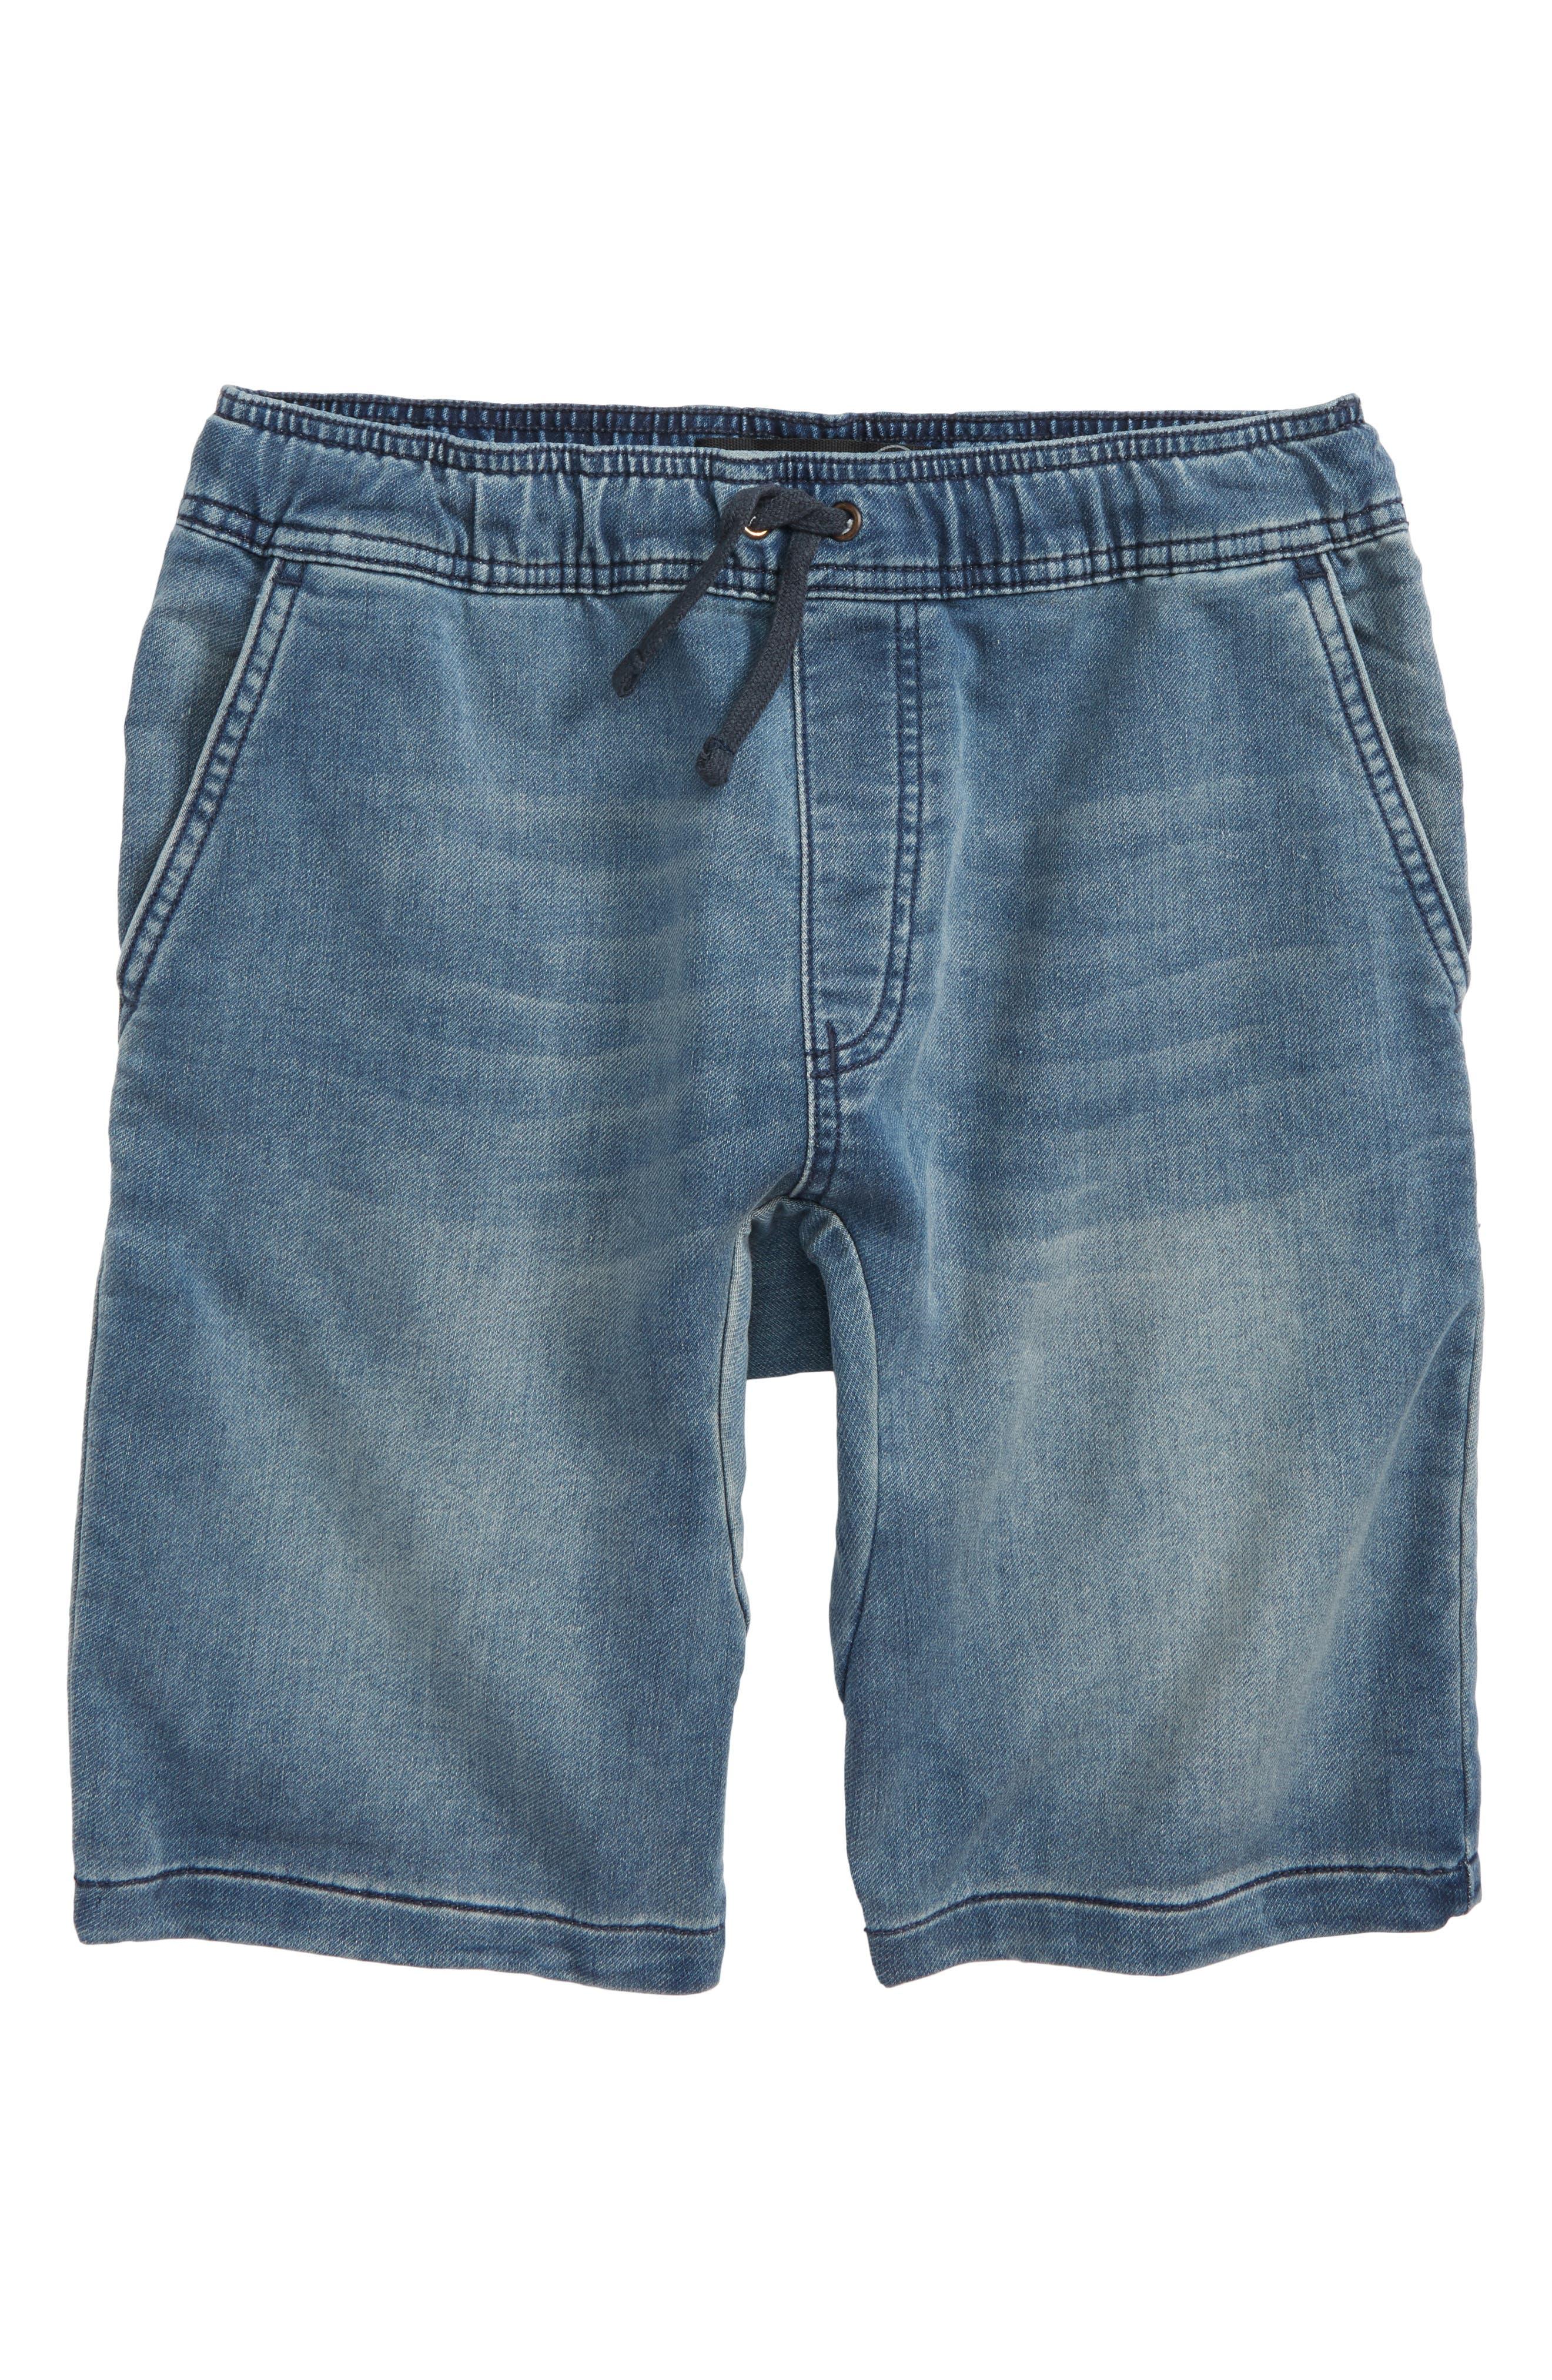 Main Image - Treasure & Bond Denim Jogger Shorts (Big Boys)